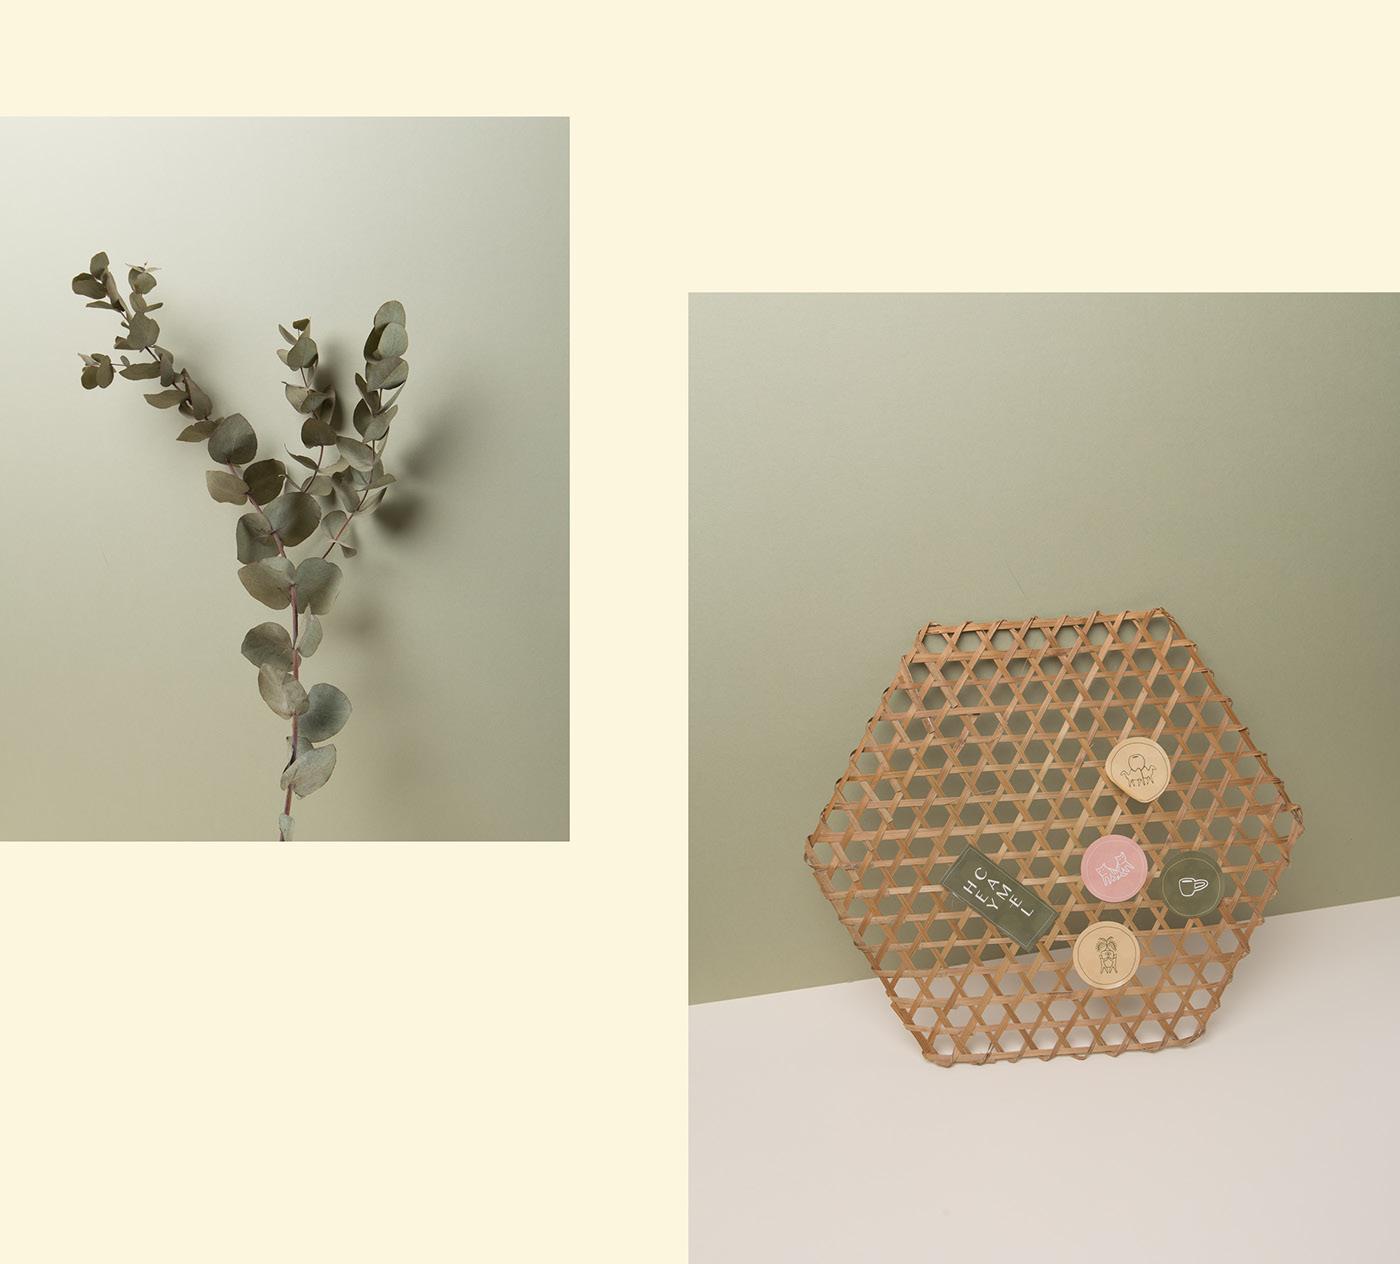 @ceramic @craft @japan @morocco @raw @refined @philosophy @symbol @impression vietnam